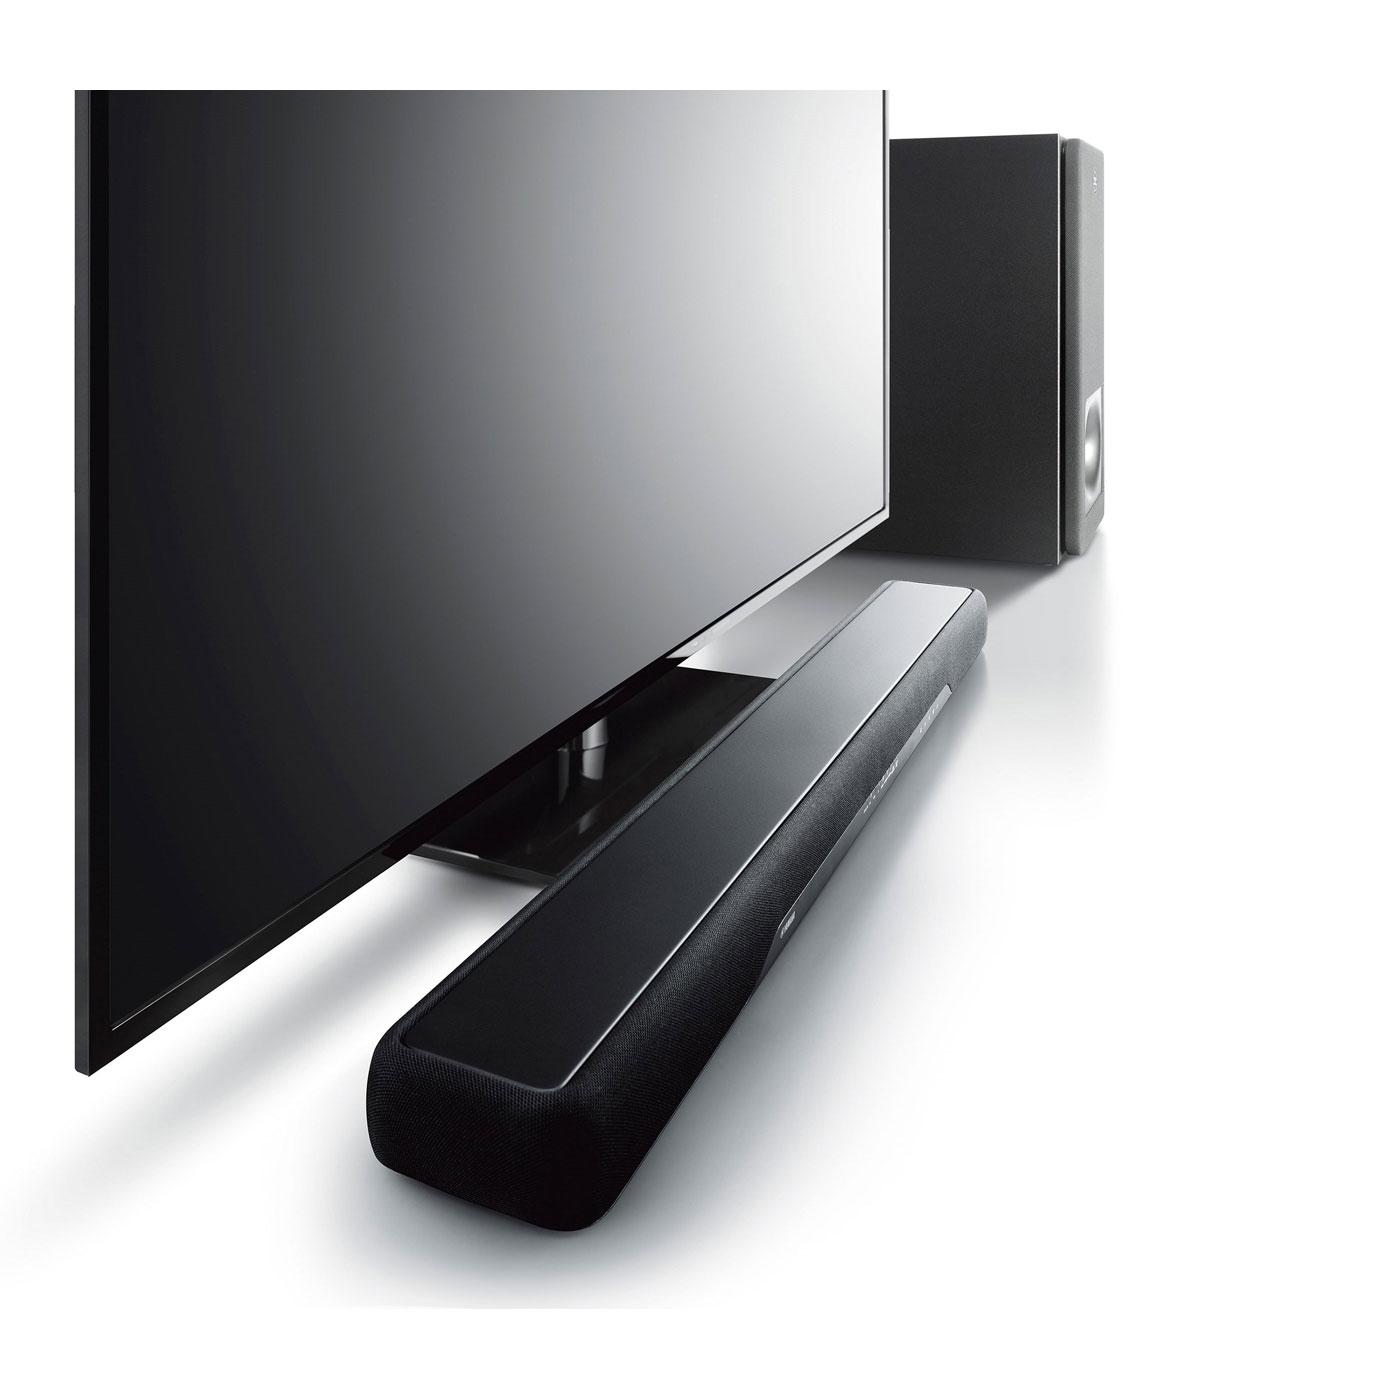 yamaha ats 2070 barre de son yamaha sur. Black Bedroom Furniture Sets. Home Design Ideas